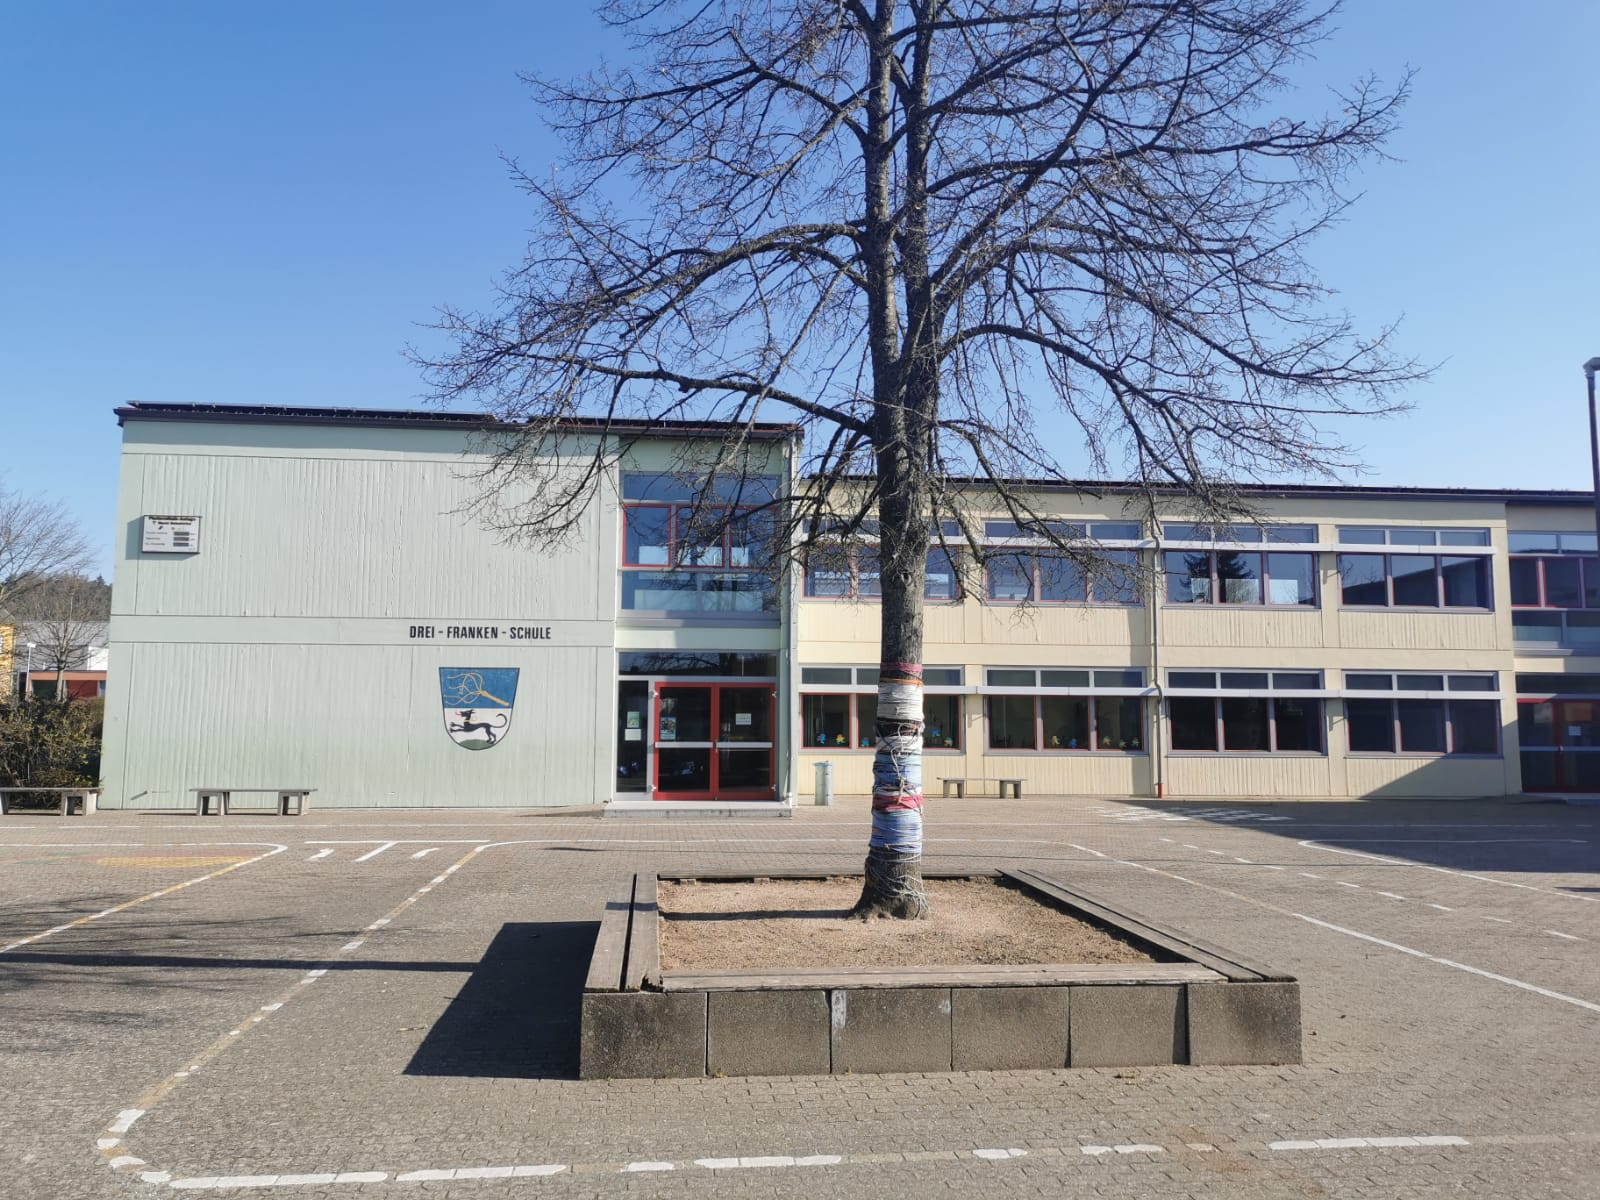 Drei-Franken-Schule Geiselwind